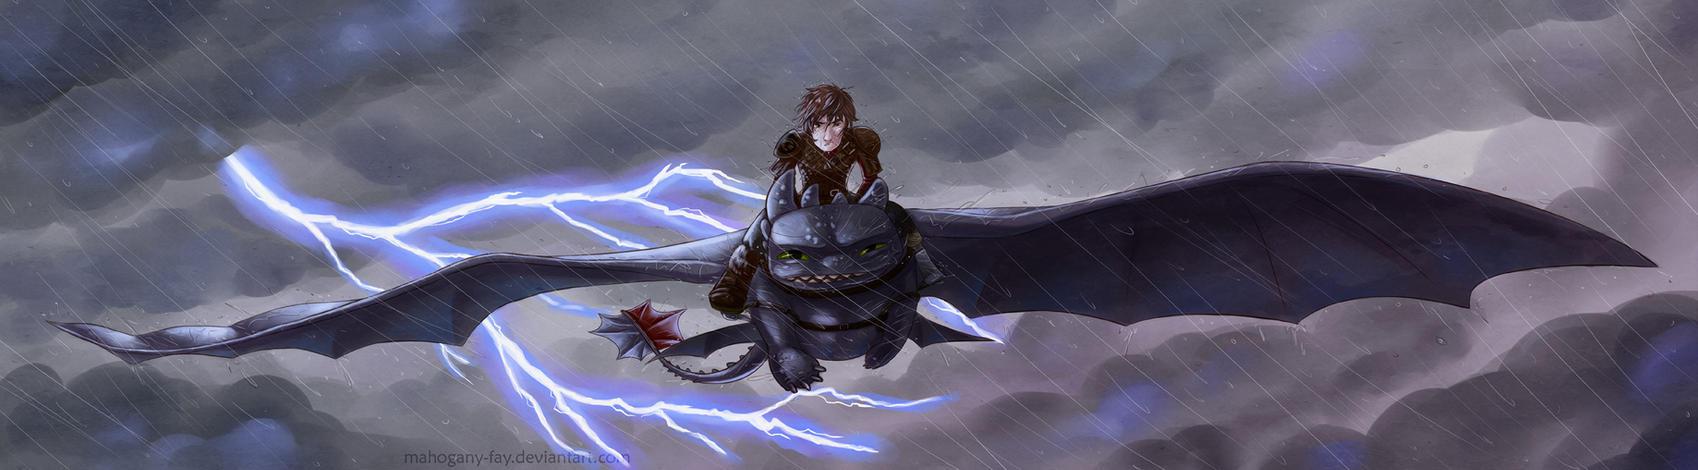 In the storm by Mahogany-Fay